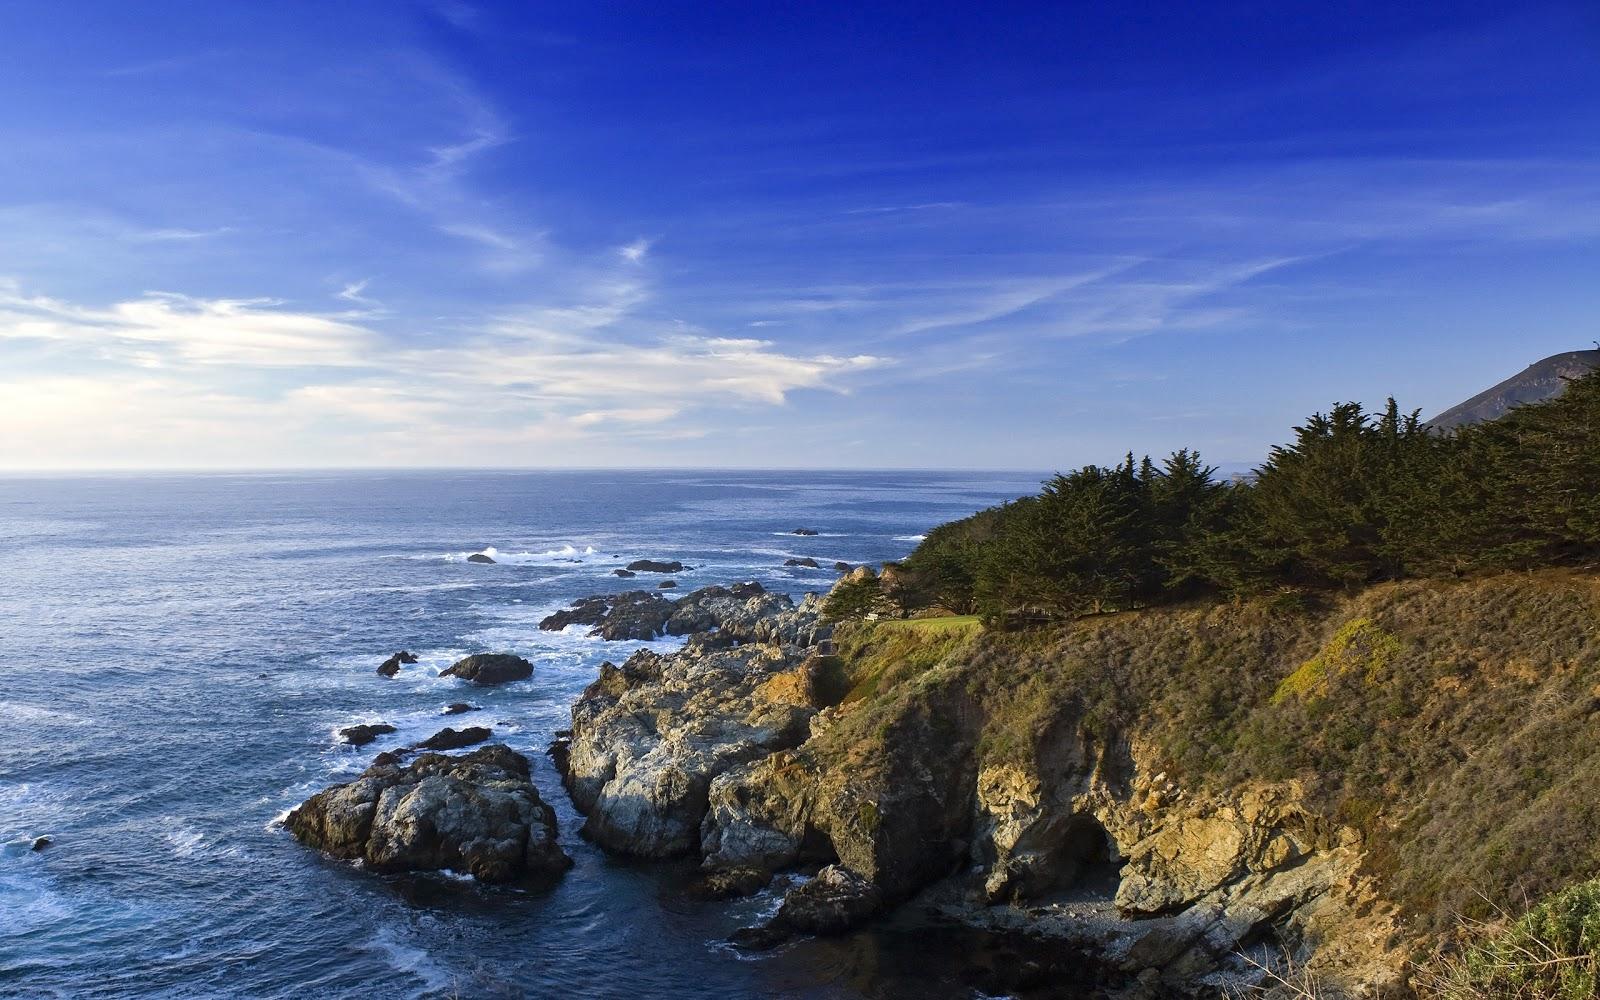 http://3.bp.blogspot.com/-KJDNSZ4fAbA/TxCzbDdAKwI/AAAAAAAAPnc/d7sVo0DEYQk/s1600/california_coast_hd_widescreen_wallpapers_2560x1600.jpg